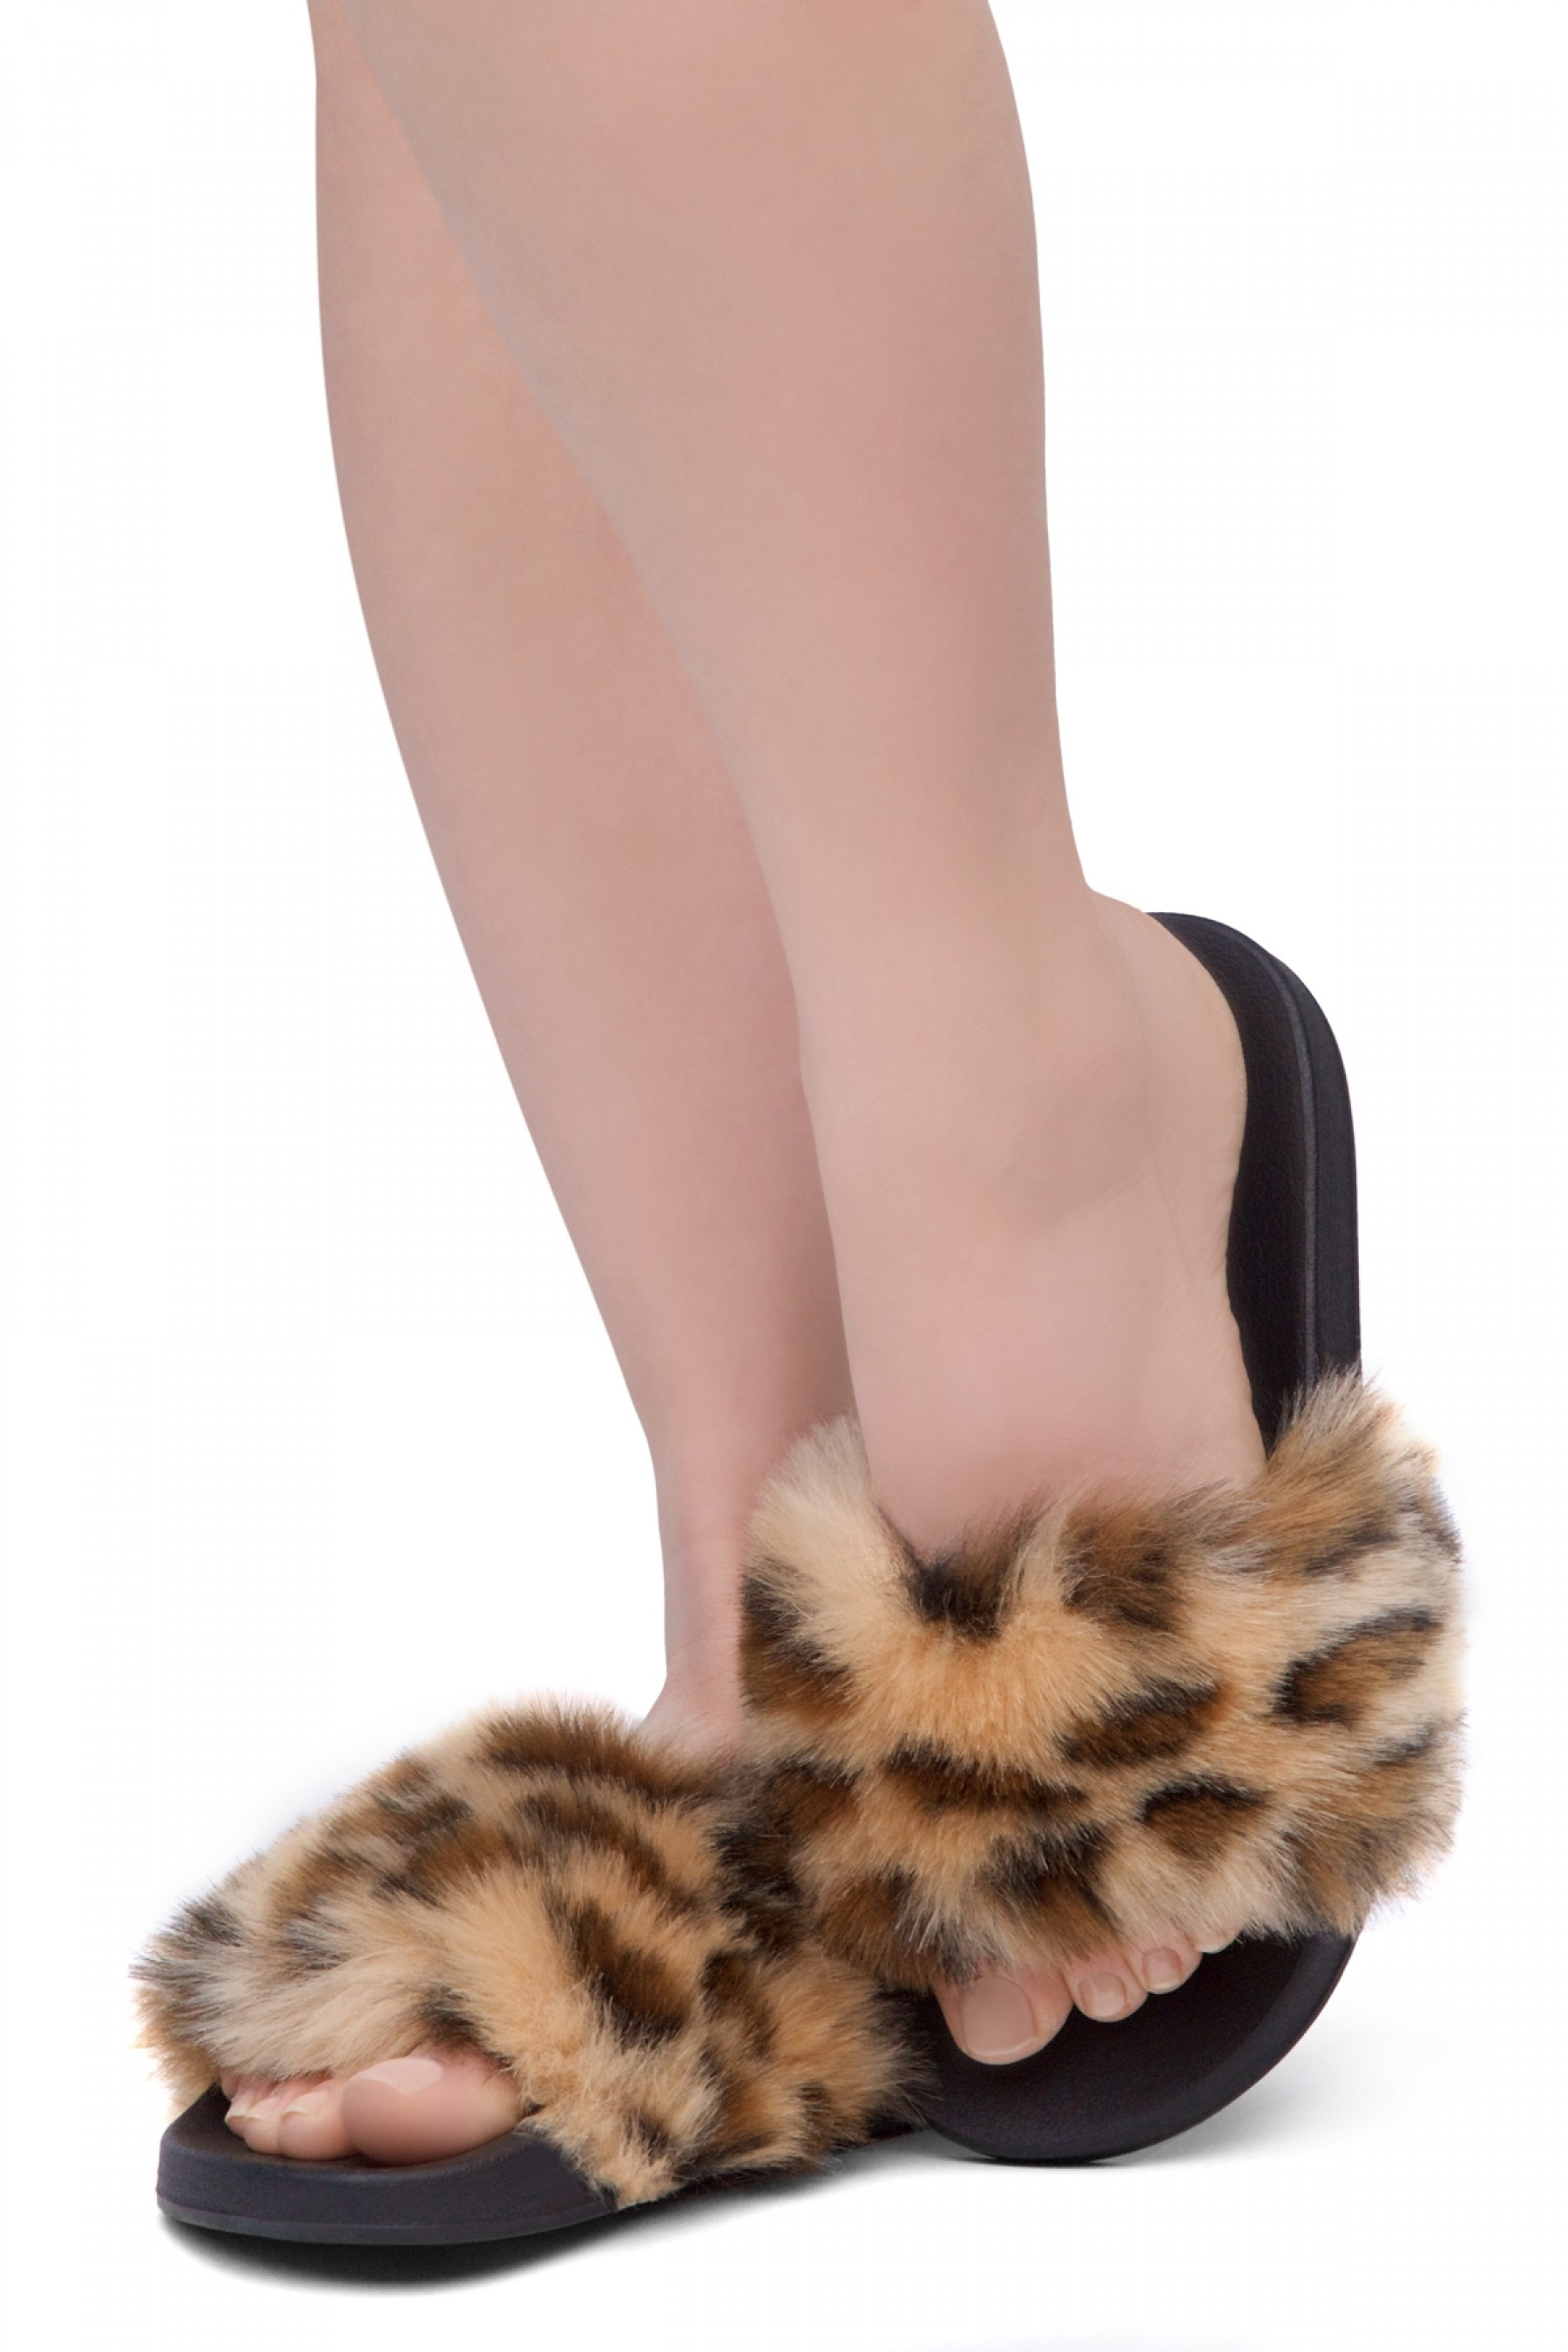 Shoe Land NIKINI Womens Fur Slides Fuzzy Slippers Fashion Fluffy Comfort Flat Sandals(2020 Leopard/Black)